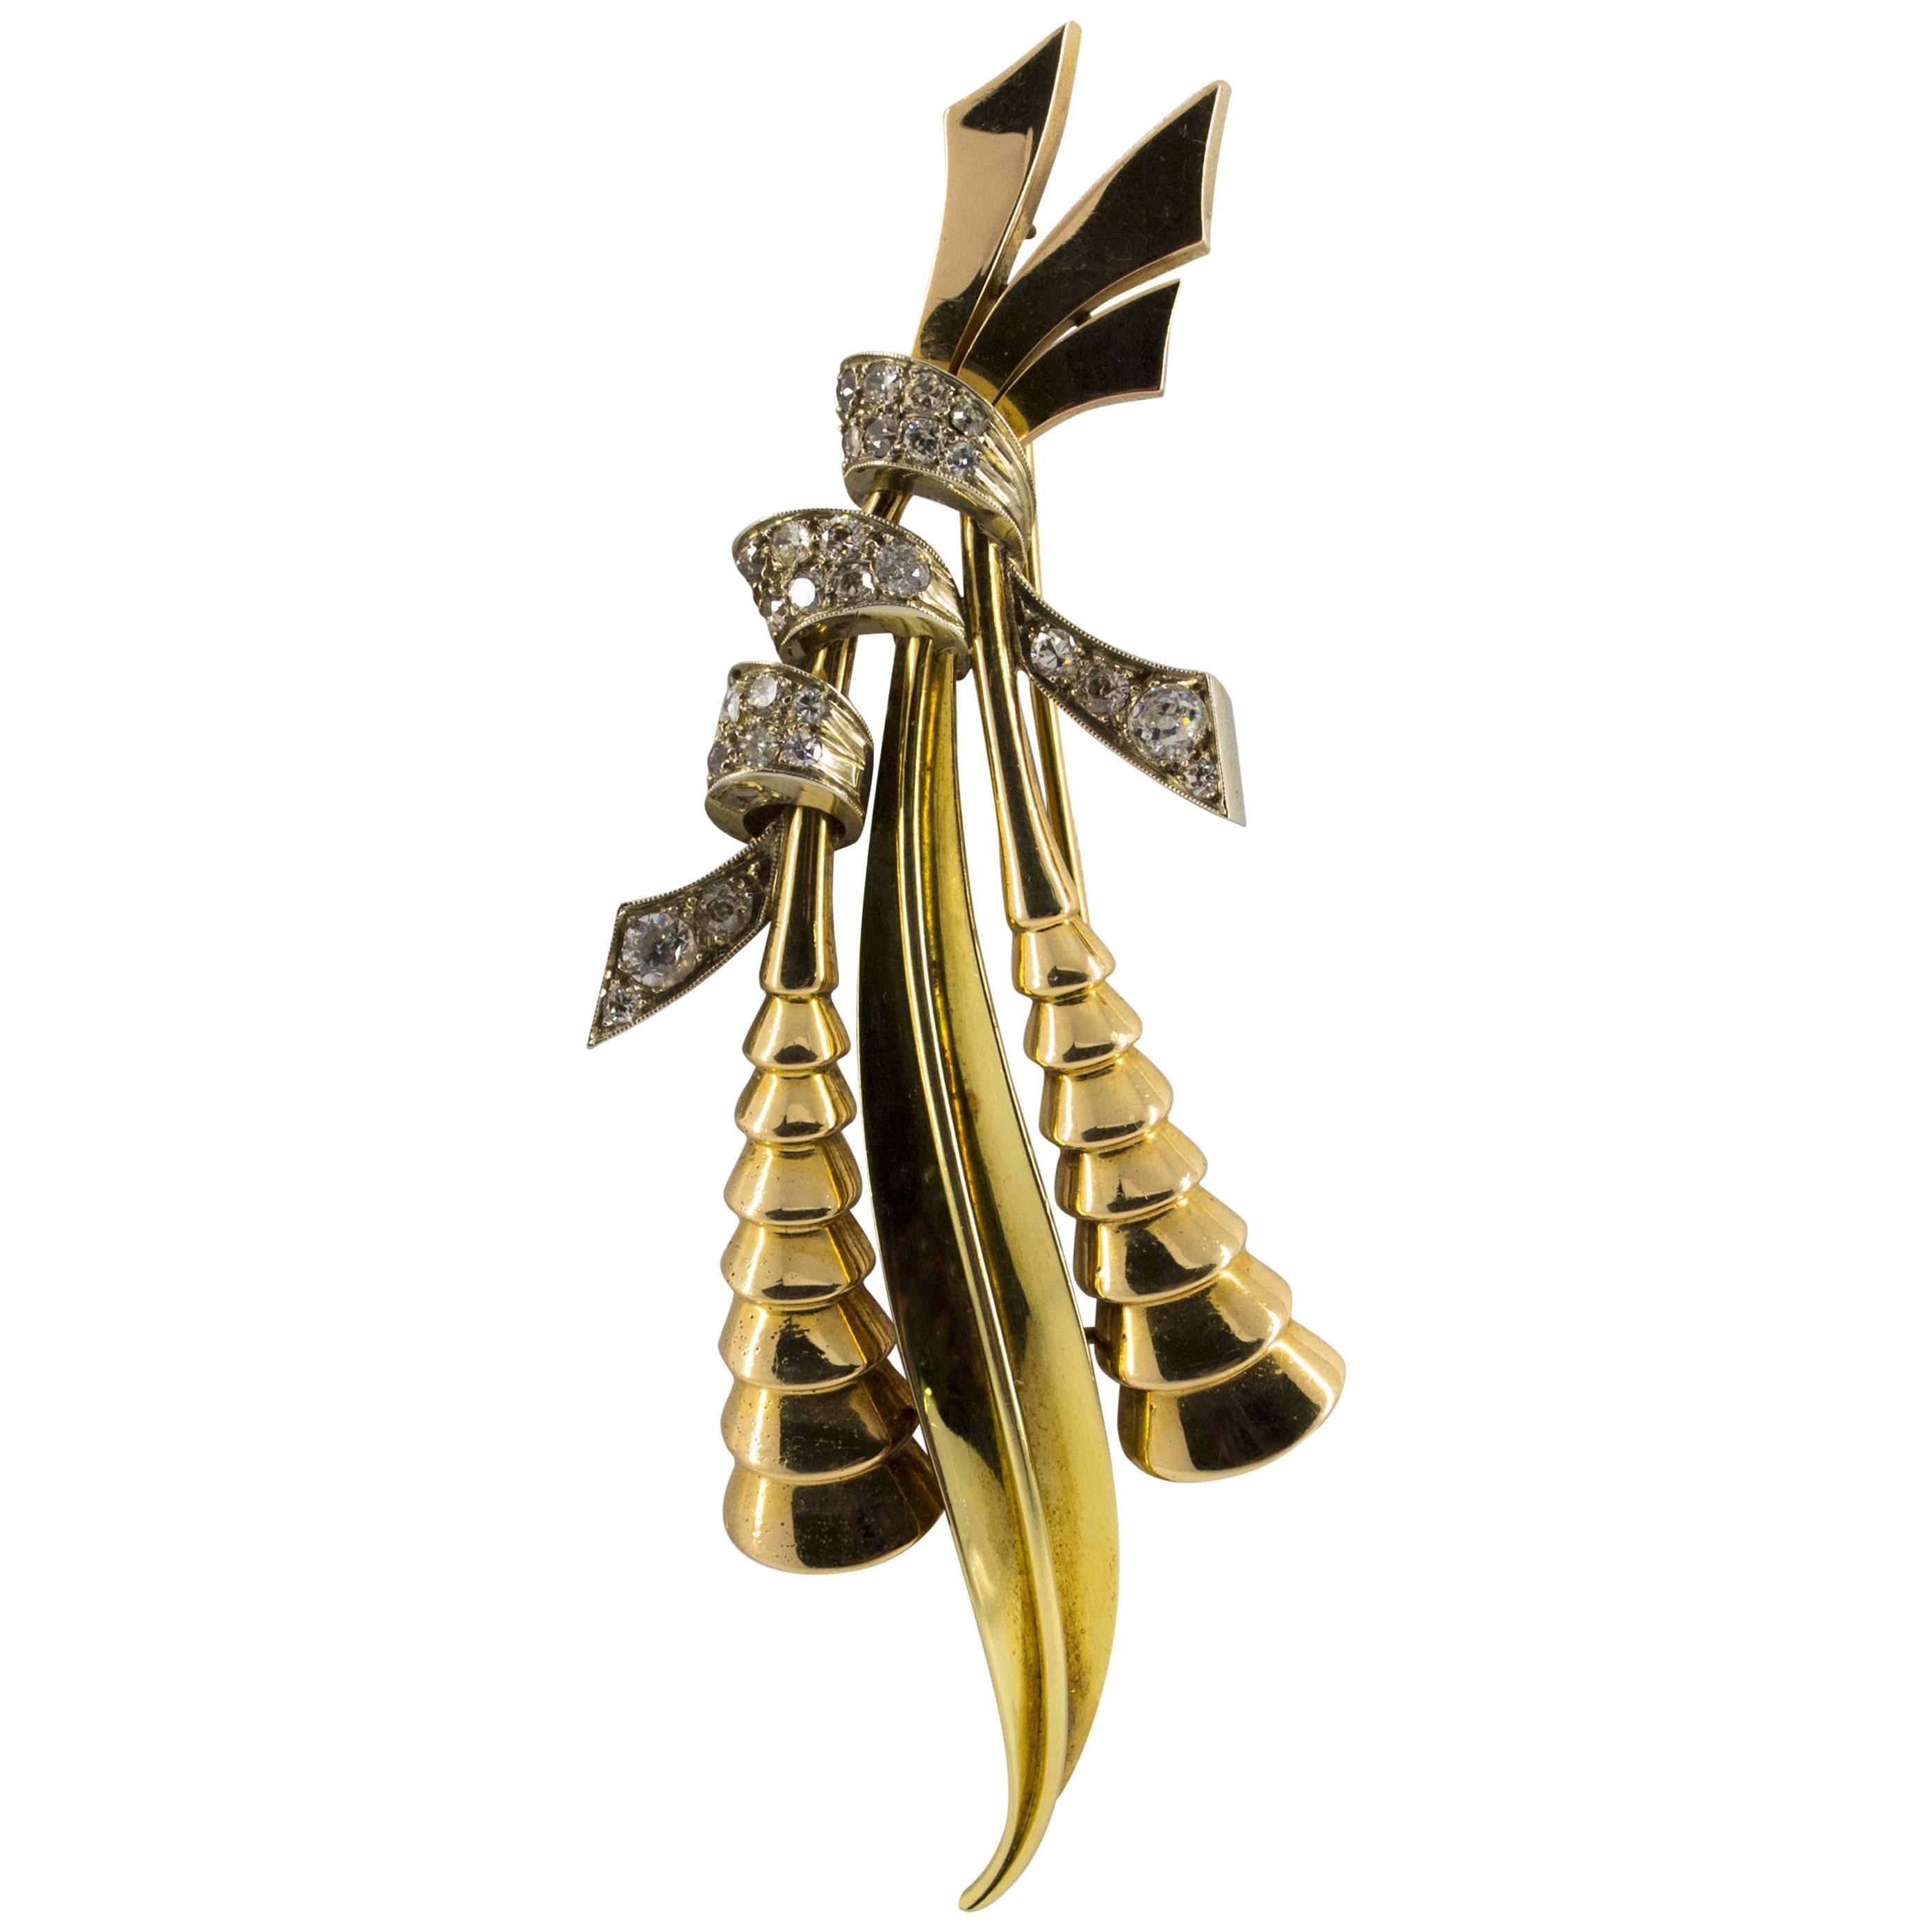 1.70 Carat Diamond Yellow and Rose Gold Brooch